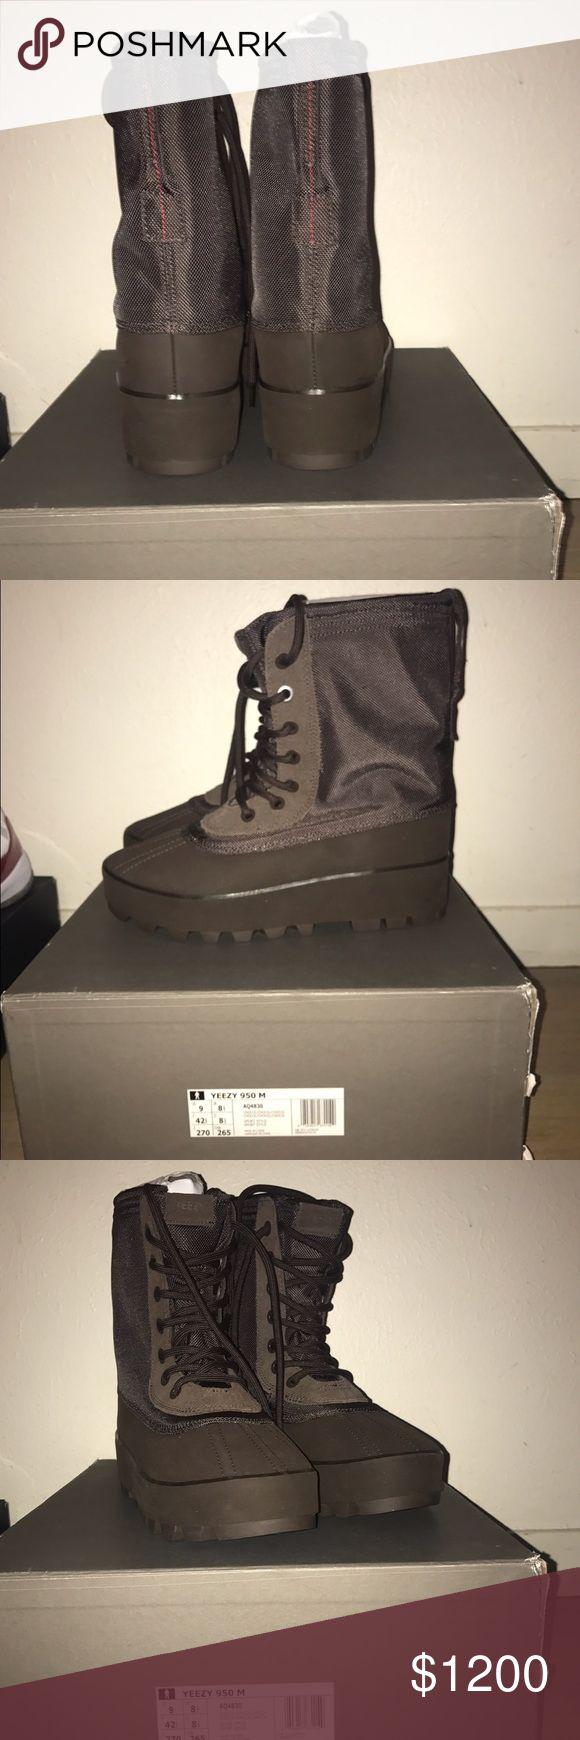 adidas nmd kids shoes yeezy boost 950 chocolate